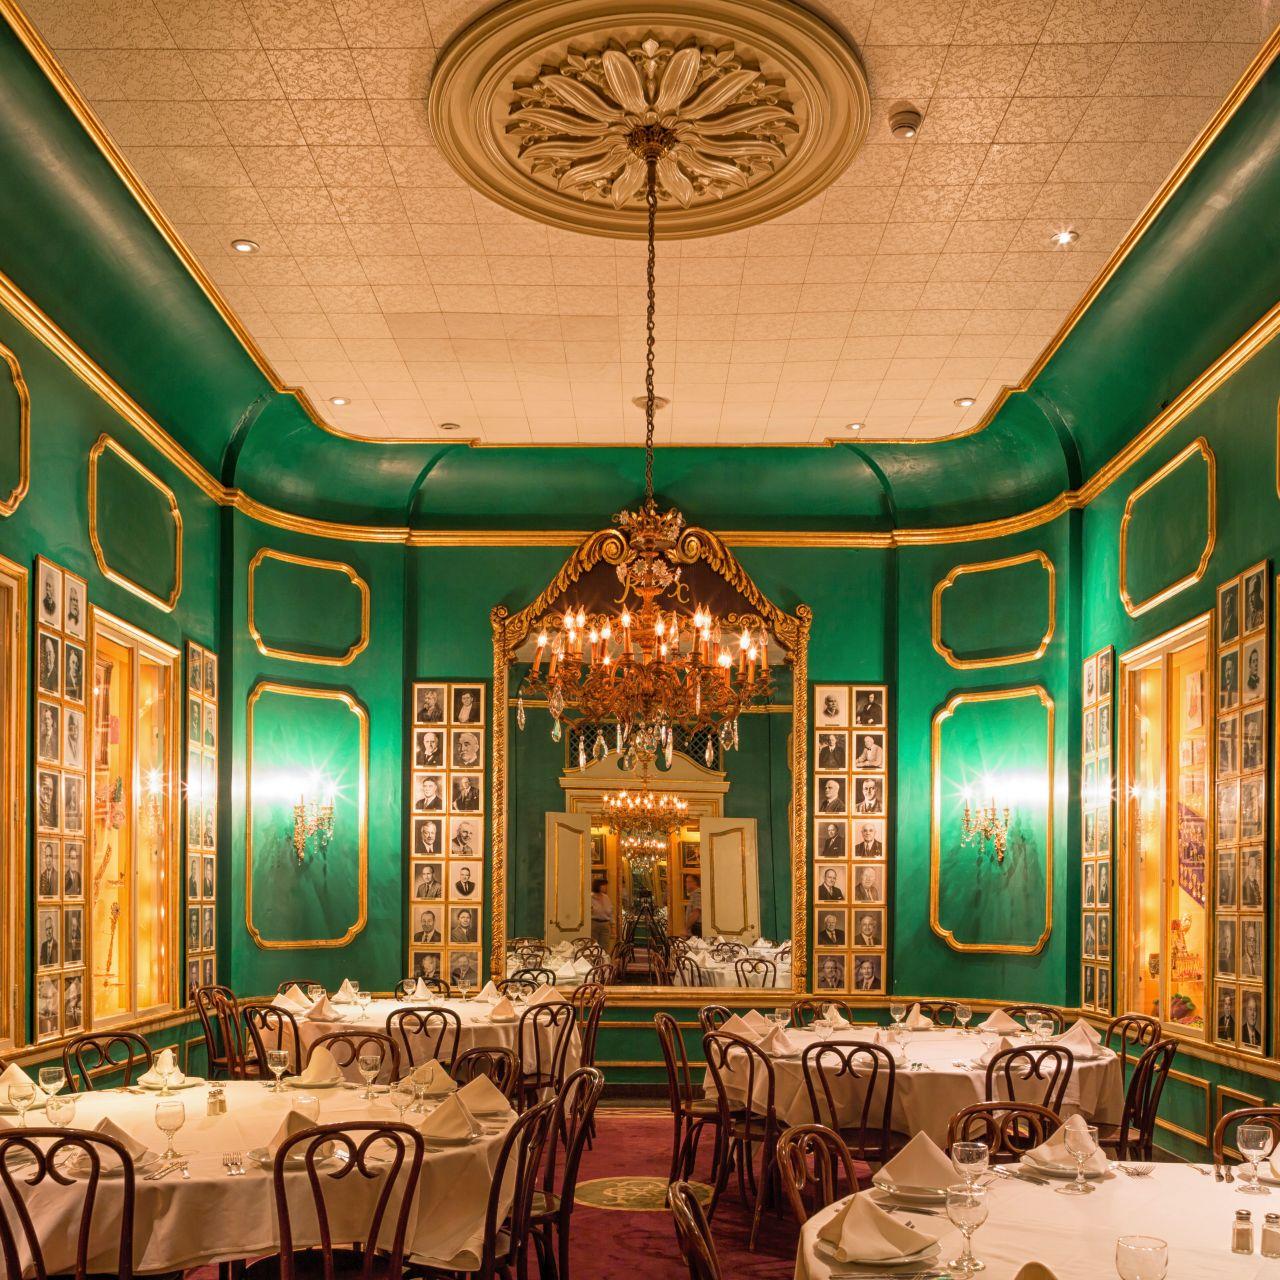 Antoine S Restaurant New Orleans La Opentable